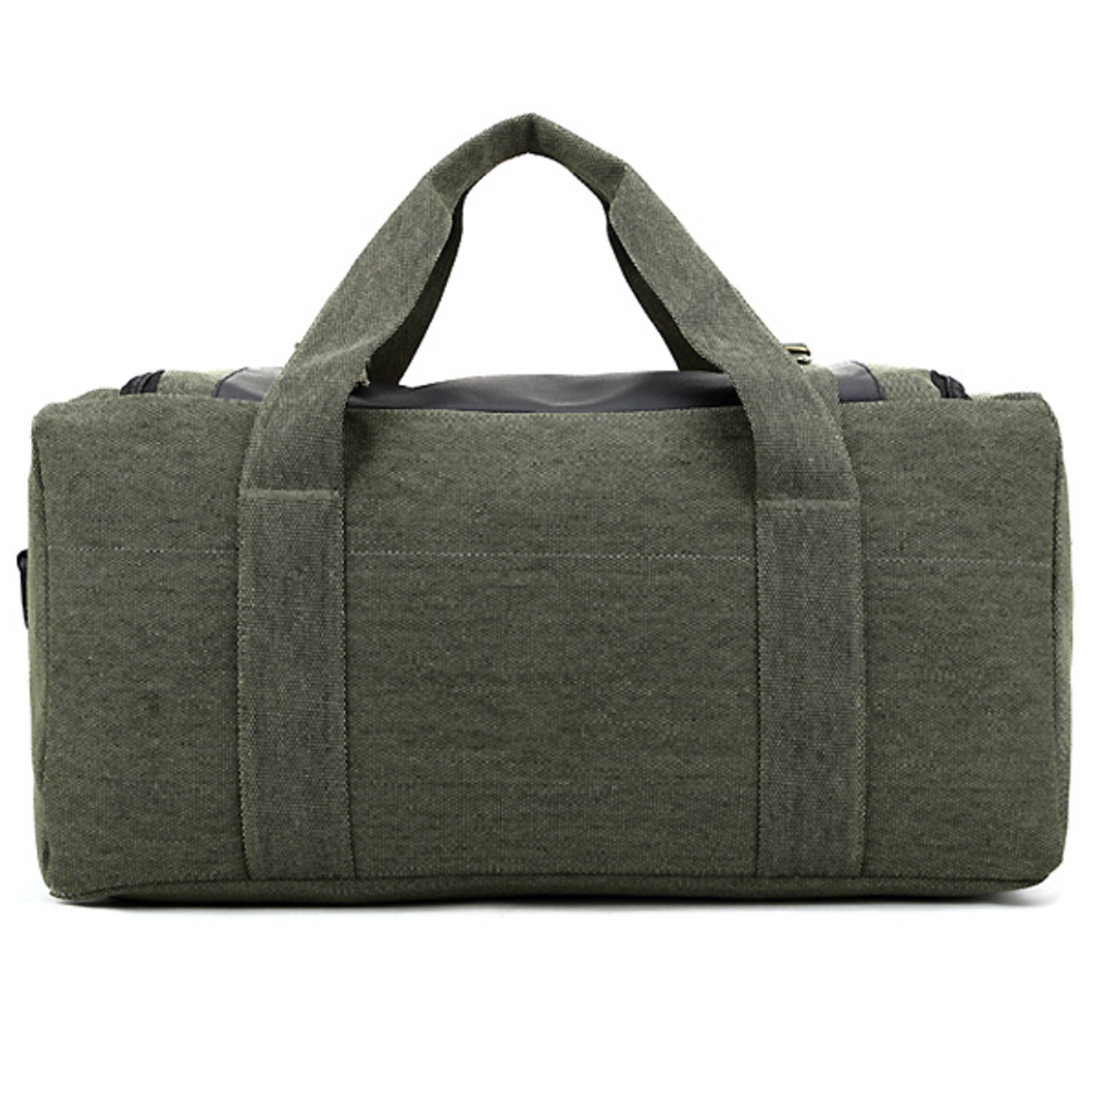 HIPSTEEN Large Capacity Canvas Men's Women Travel Bags Cross-body Bag Handbag Luggage Bag Men Travel Bags - Size S / L Hot Sale 8